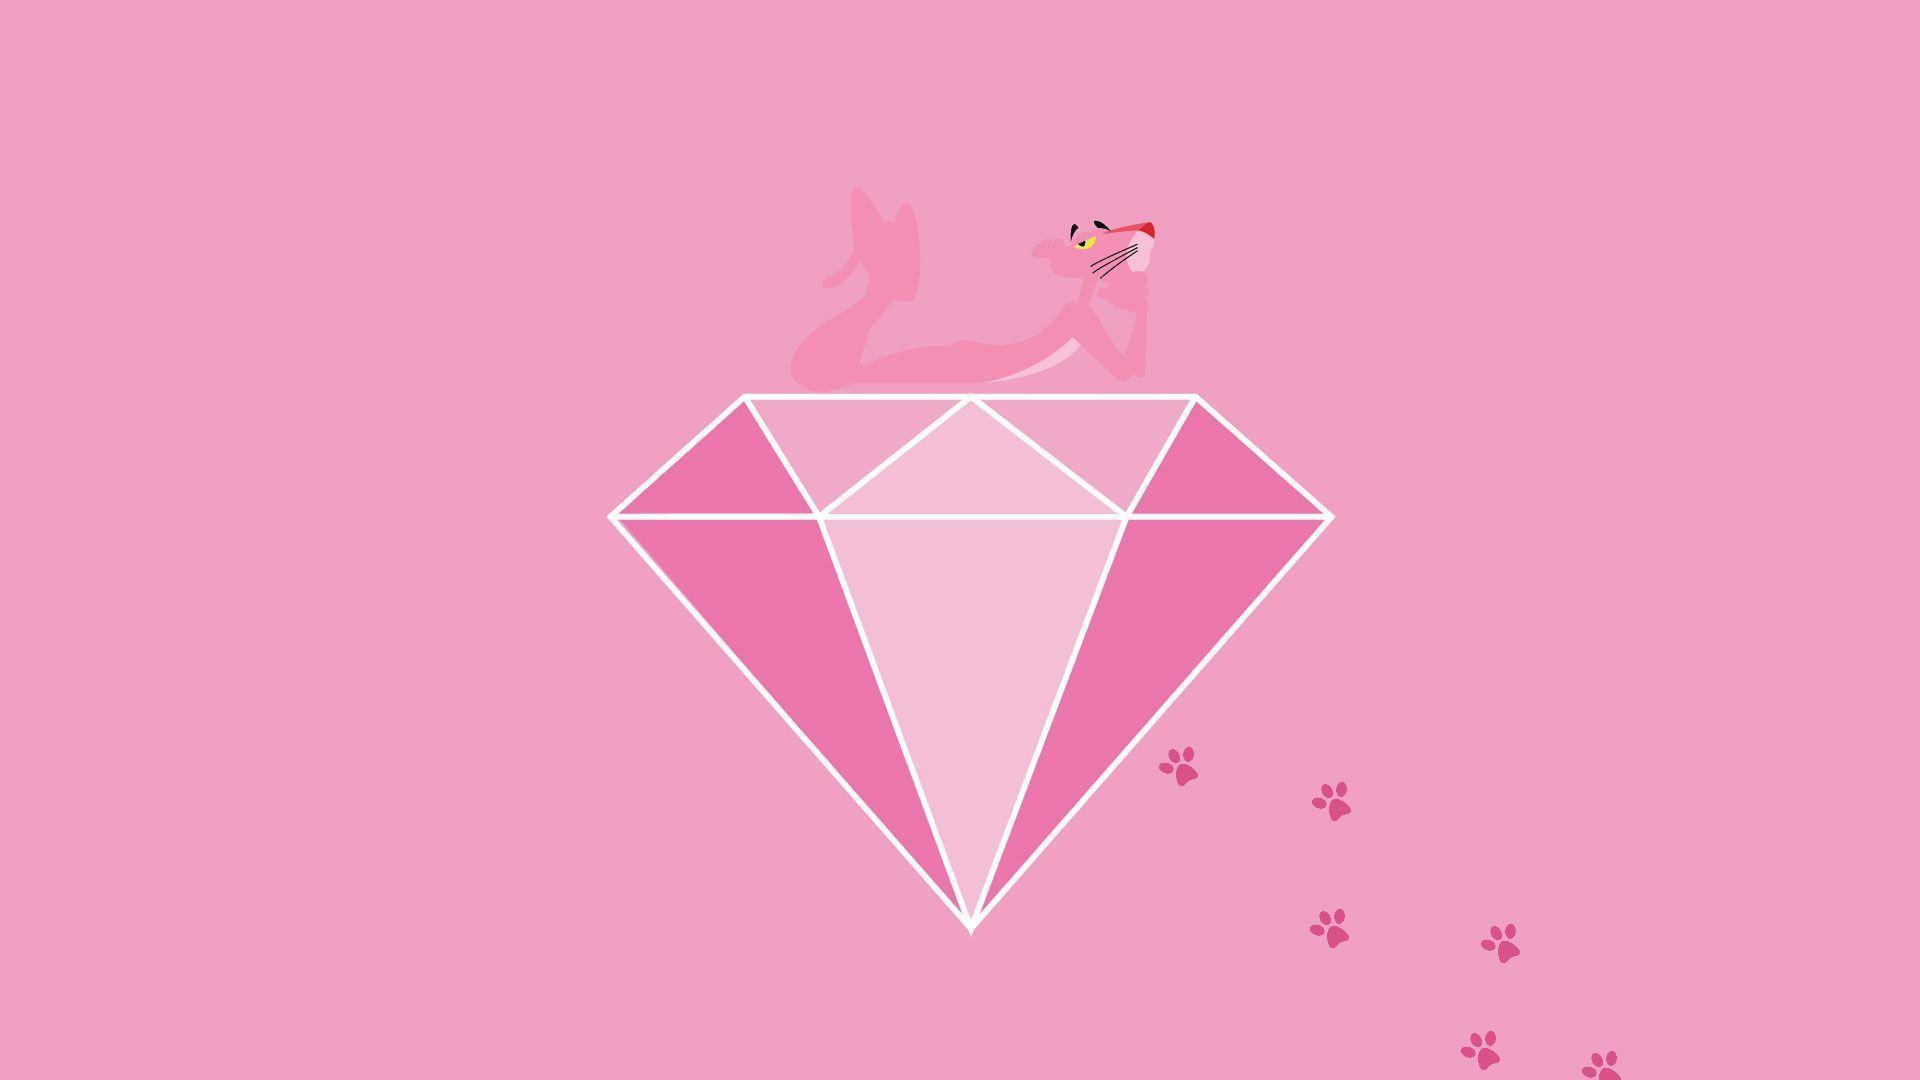 pink banther